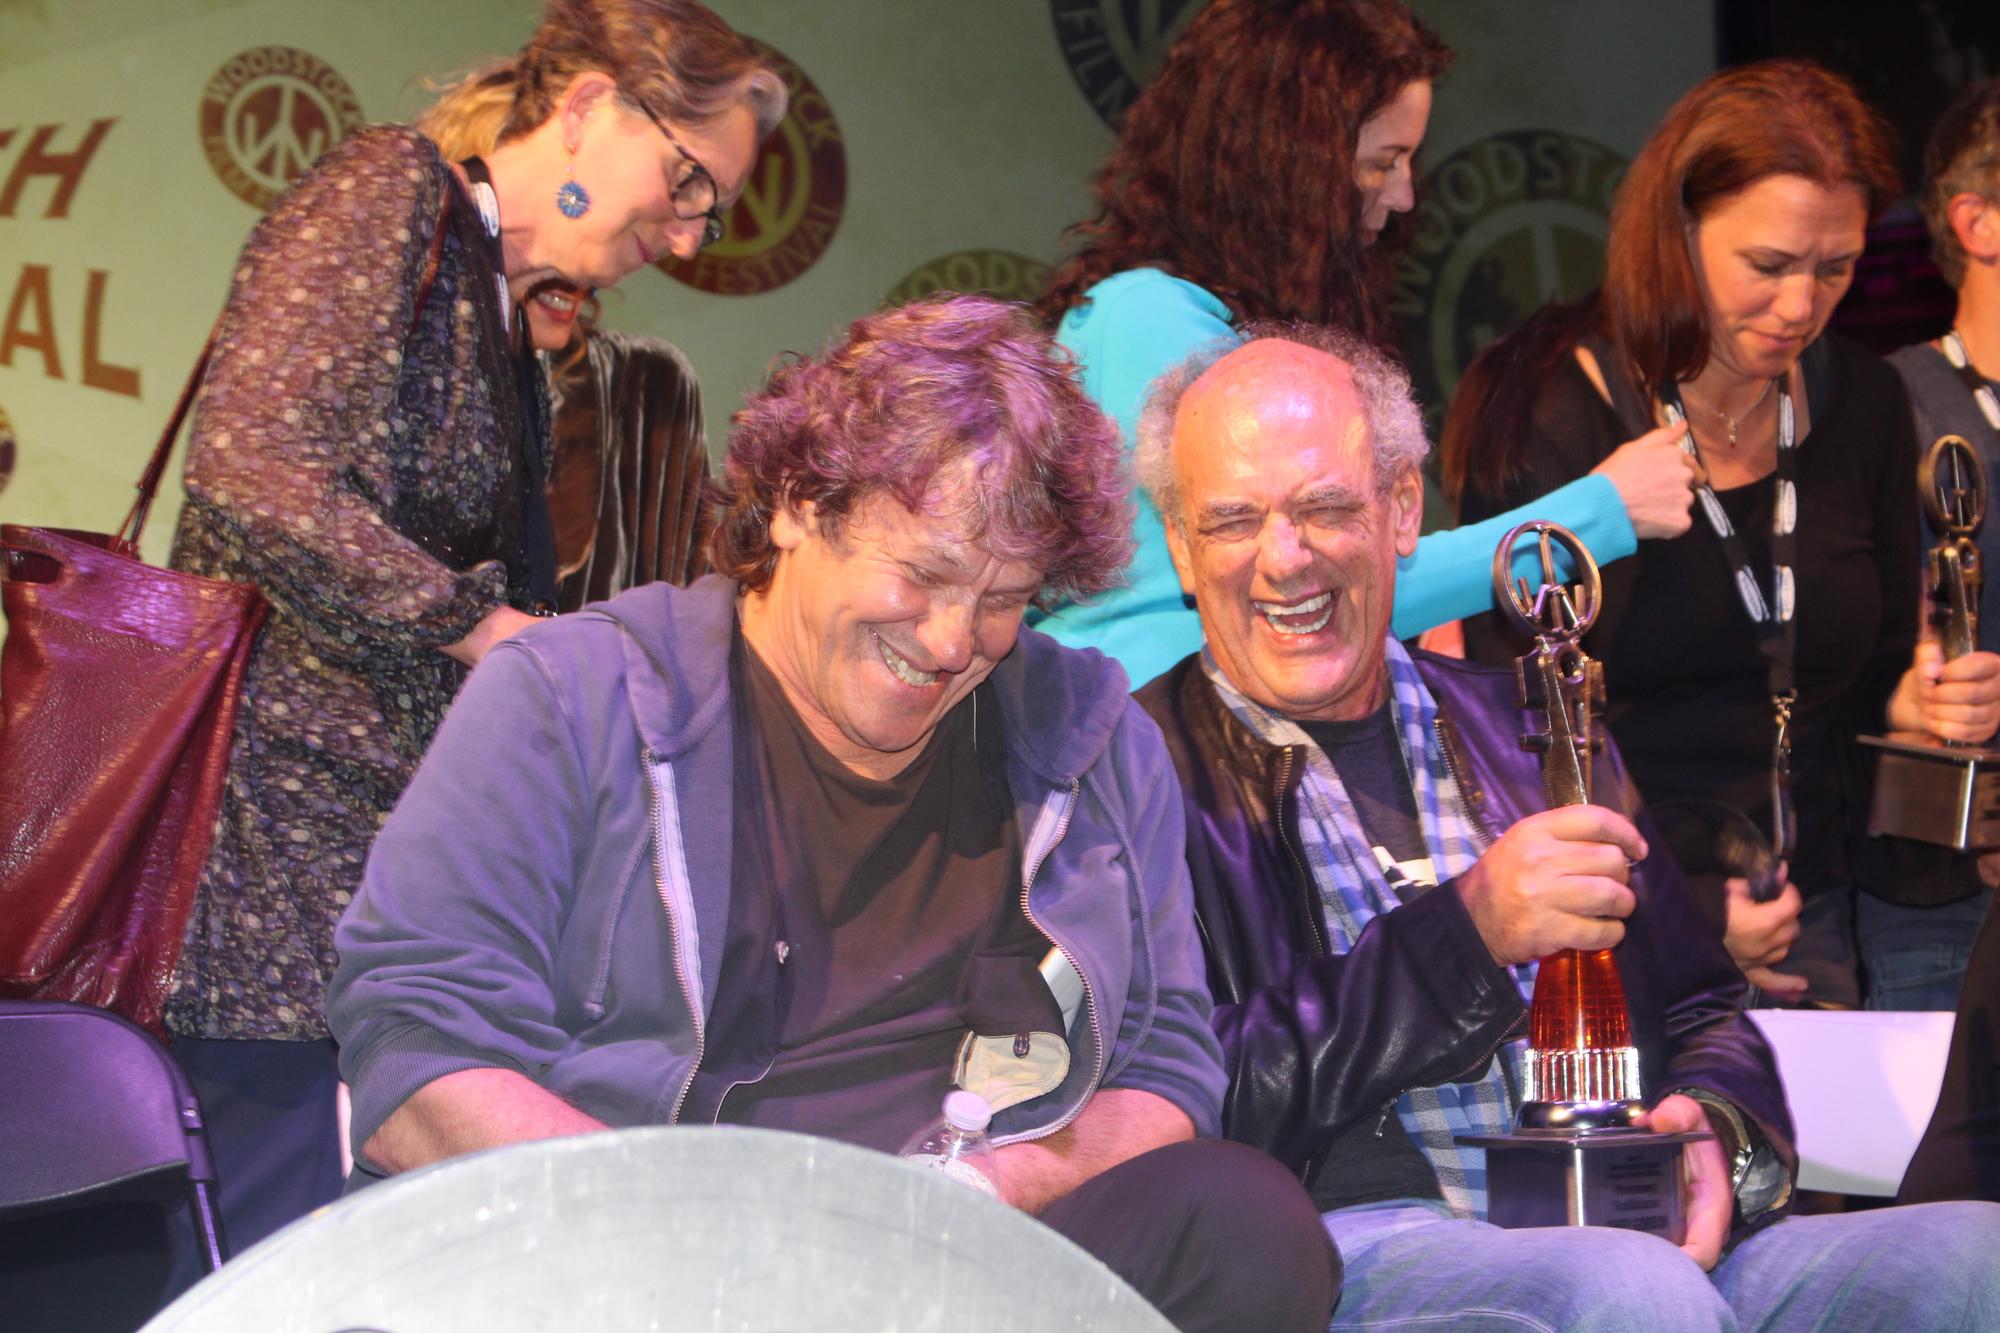 Shep Gordan and Michael Lang at the 2017 Woodstock Film Festival Maverick Awards